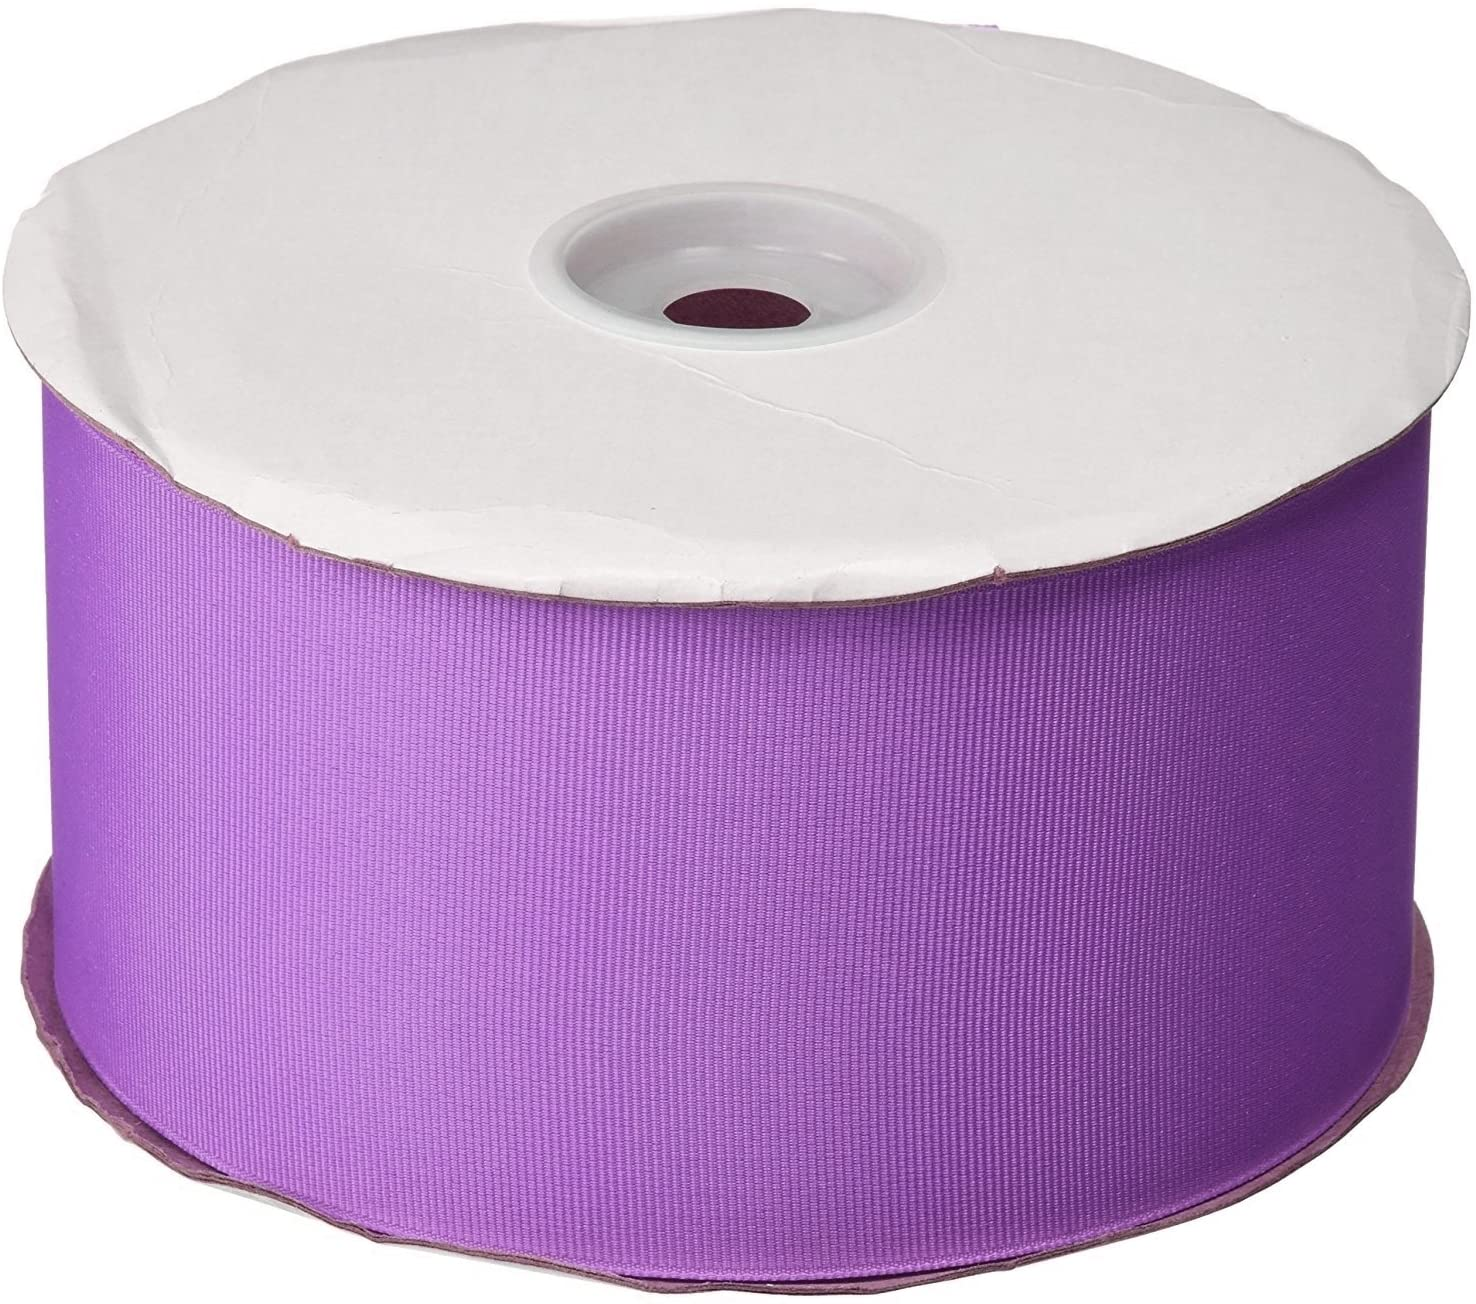 Ben Collection 4 Inch X 25 Yard Grosgrain Plain Ribbon Party, Wedding Favor Crafting Ribbon (Lavender)